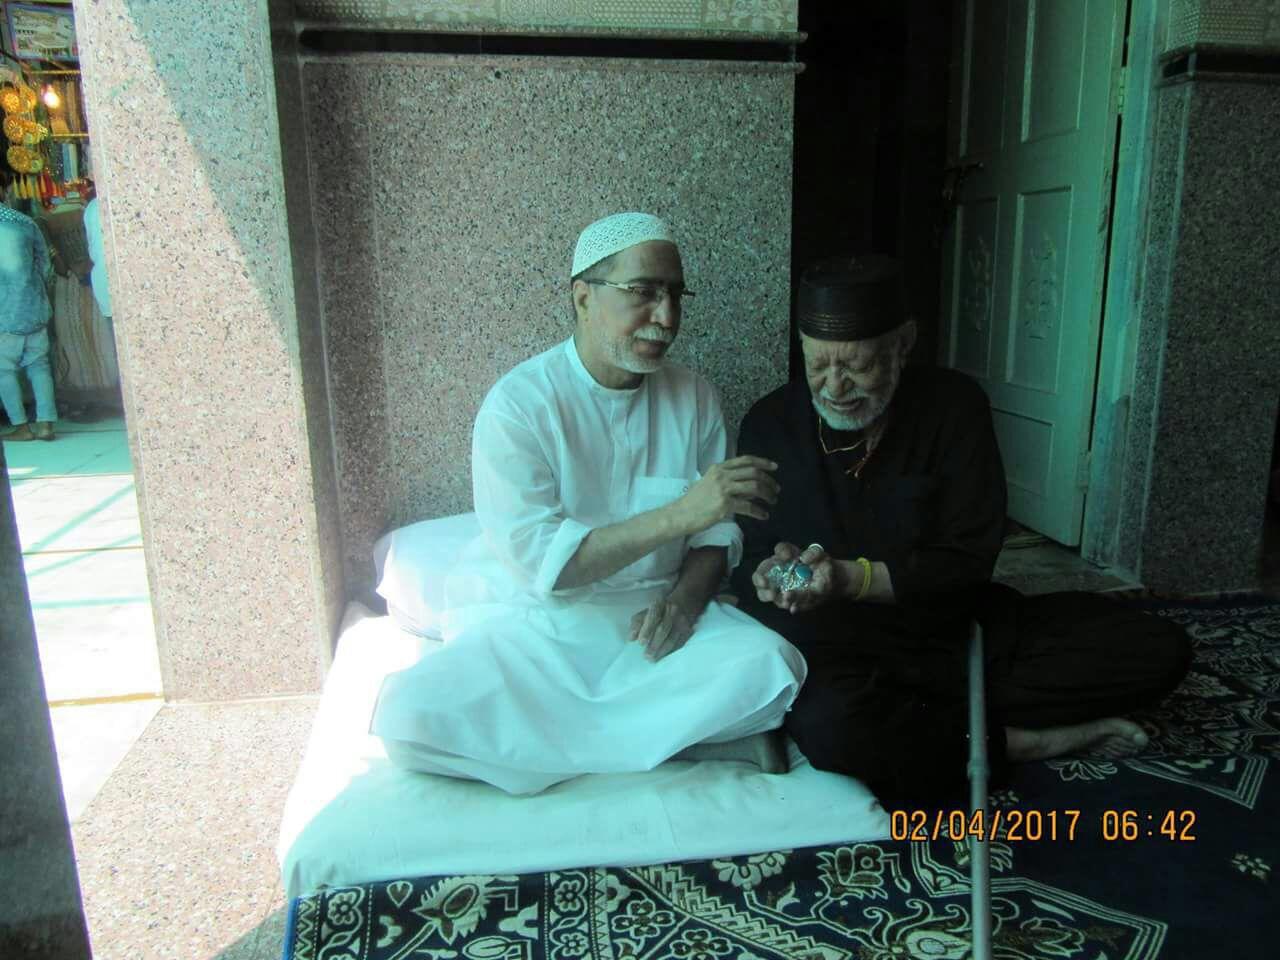 Urs Festival 2017 - invitation of Babaji of Anglo Asian Friendship Society multi-faith charity